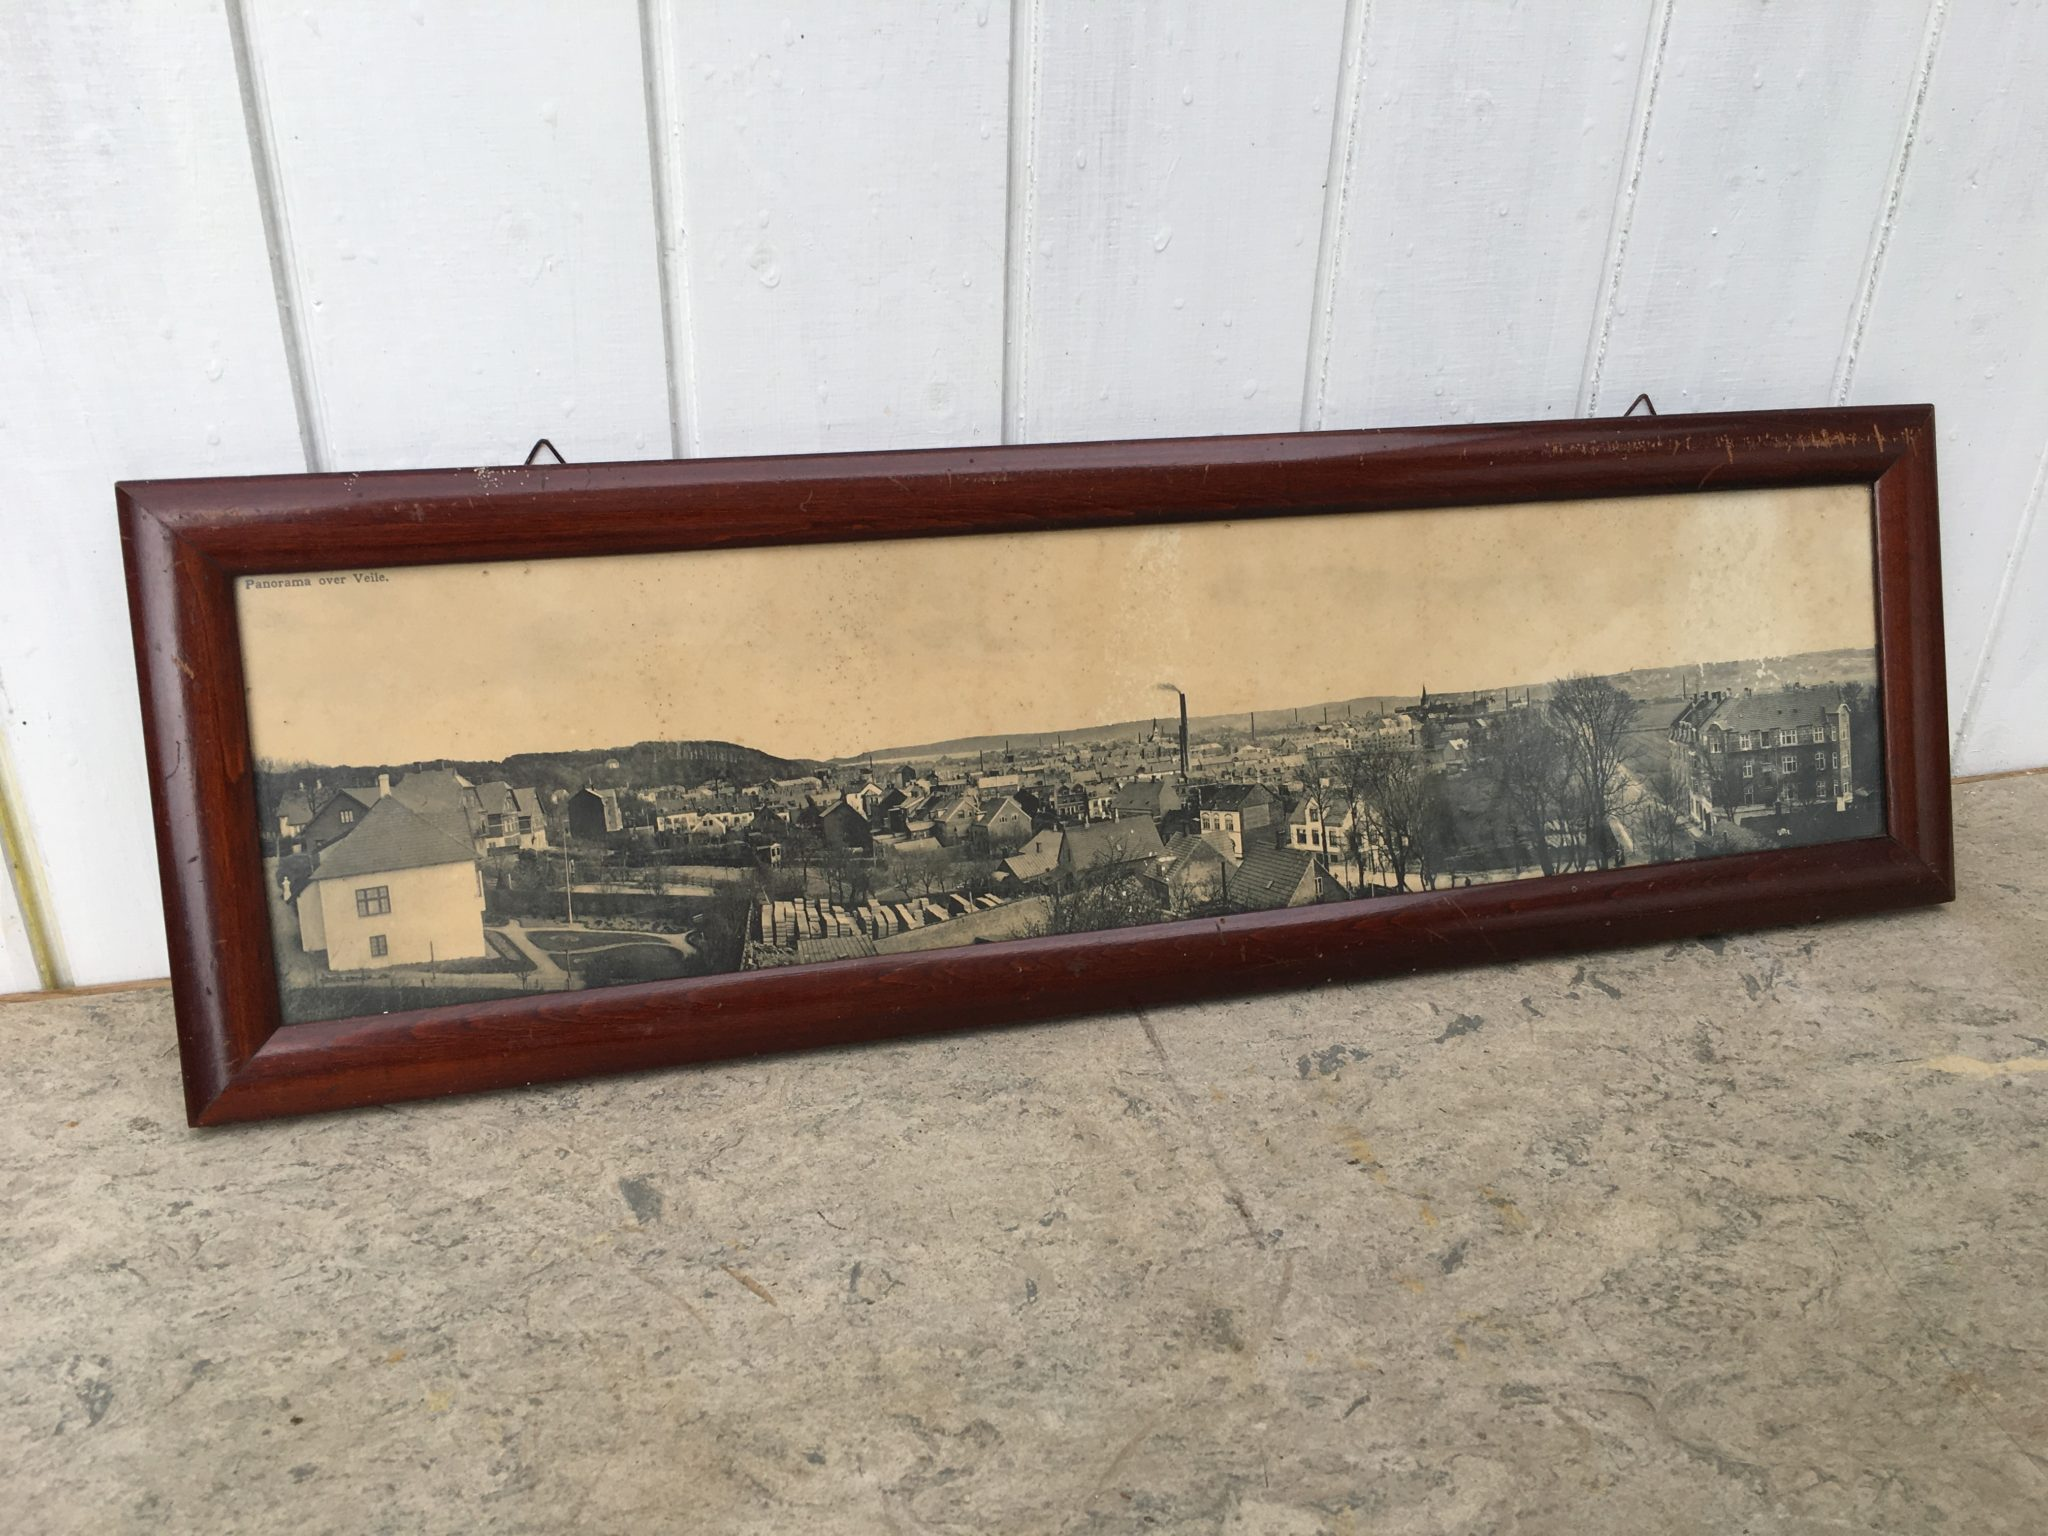 Vejle By, gammelt panoramafoto, pris 150 kr